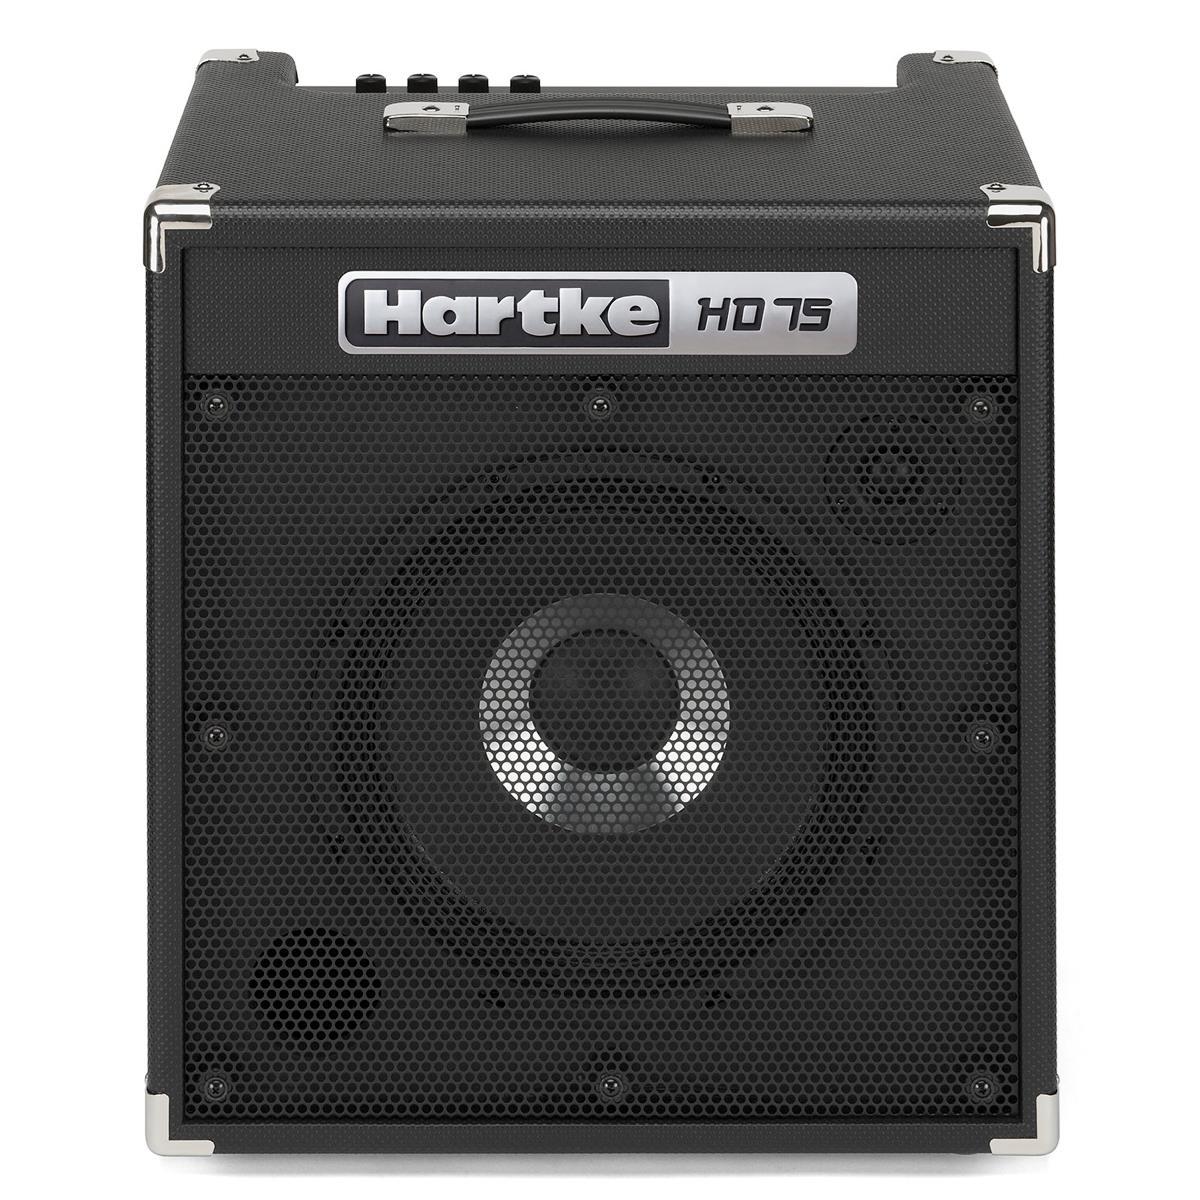 Hartke HD75 - 1x12 - 75W - Bassi Amplificatori - Combo